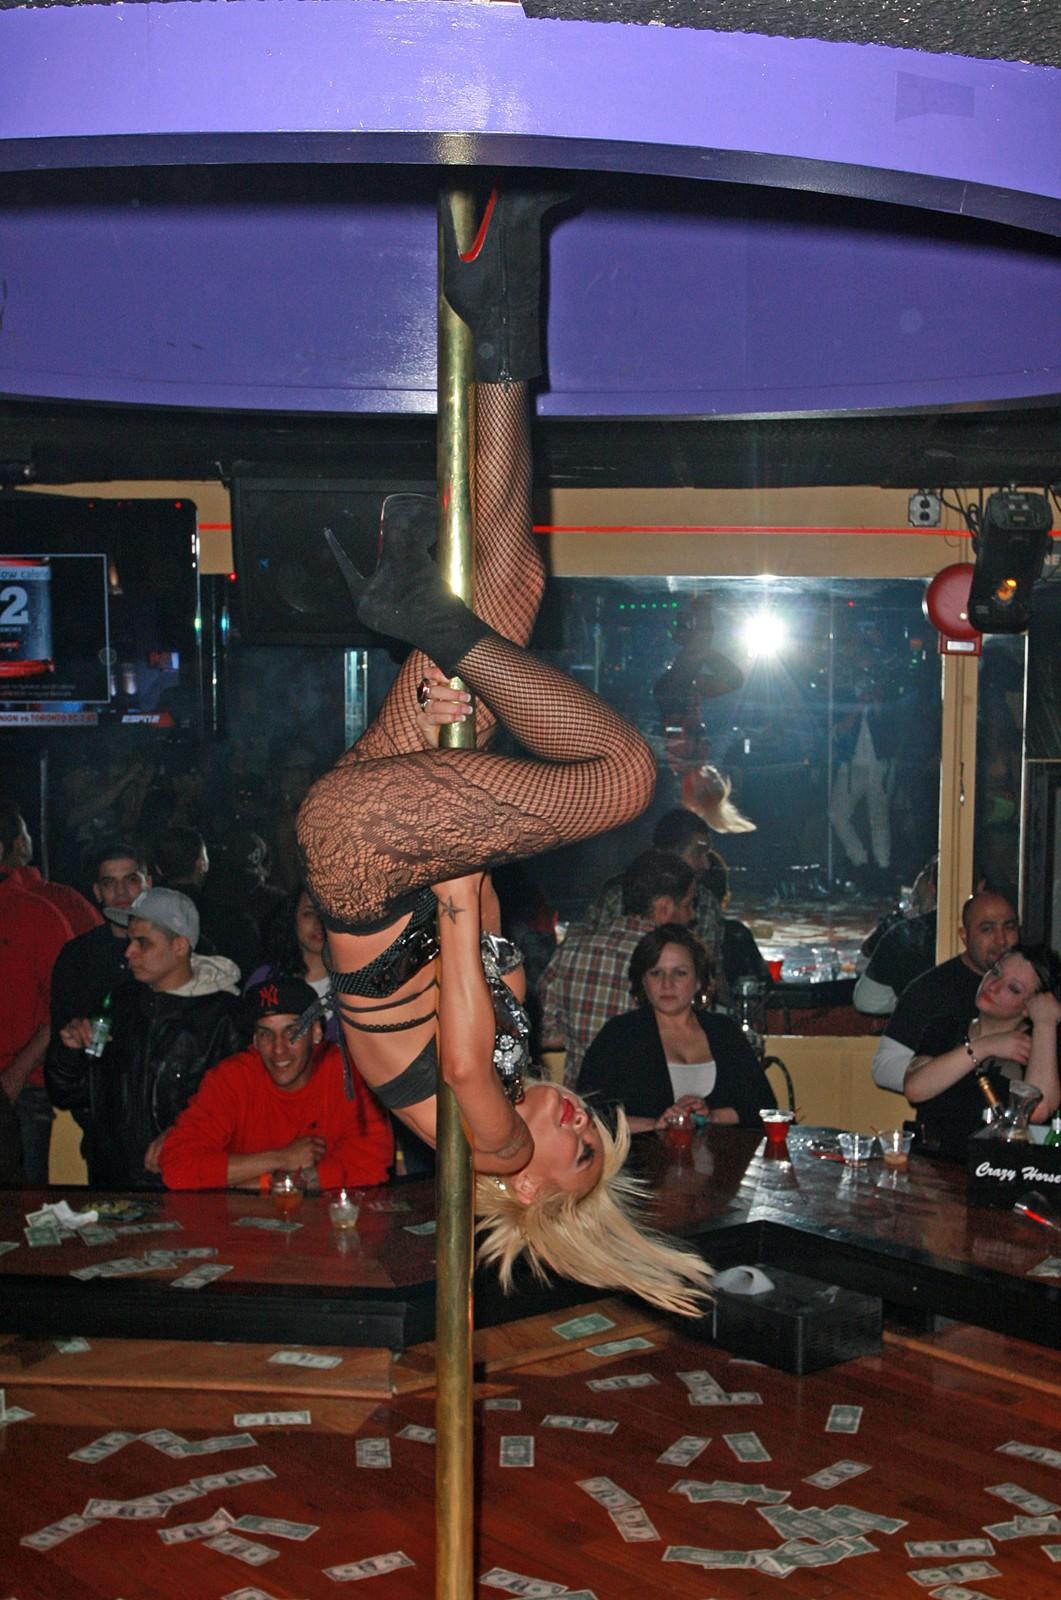 Sex, Drugs, Violence Celebrities All Inside Sin City A Bronx Strip Club